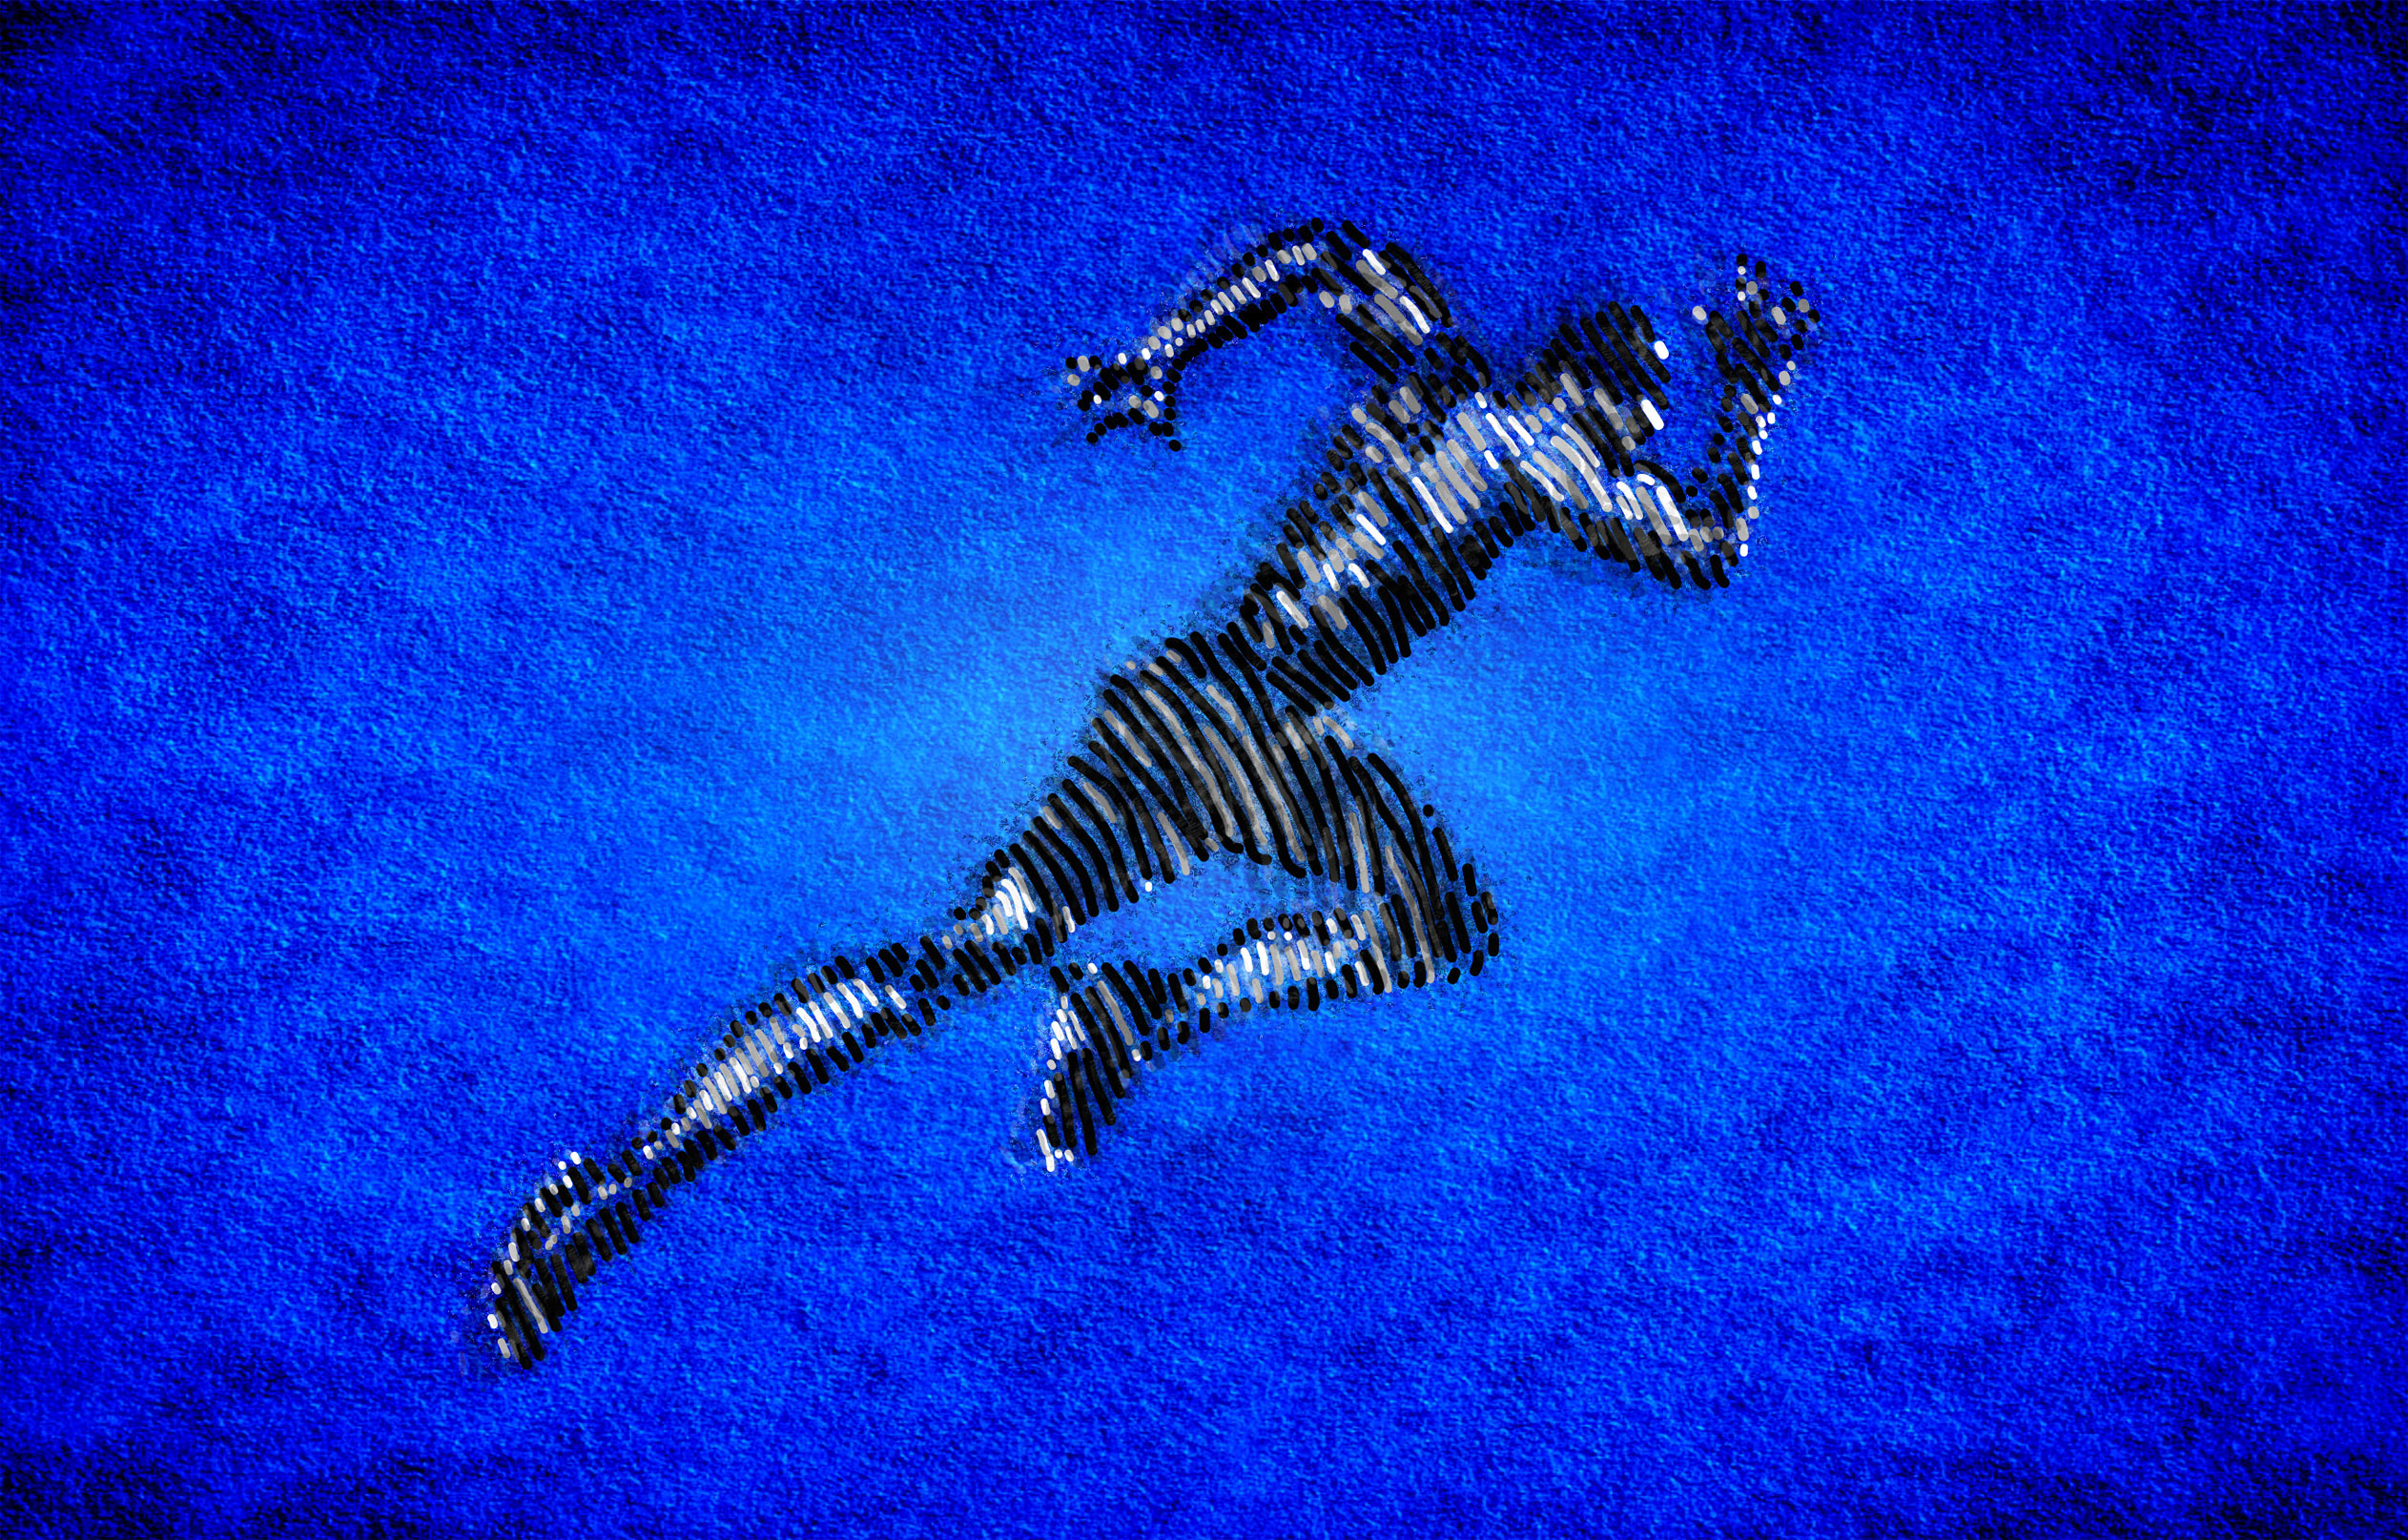 Born to run - male athlete sprinting photo